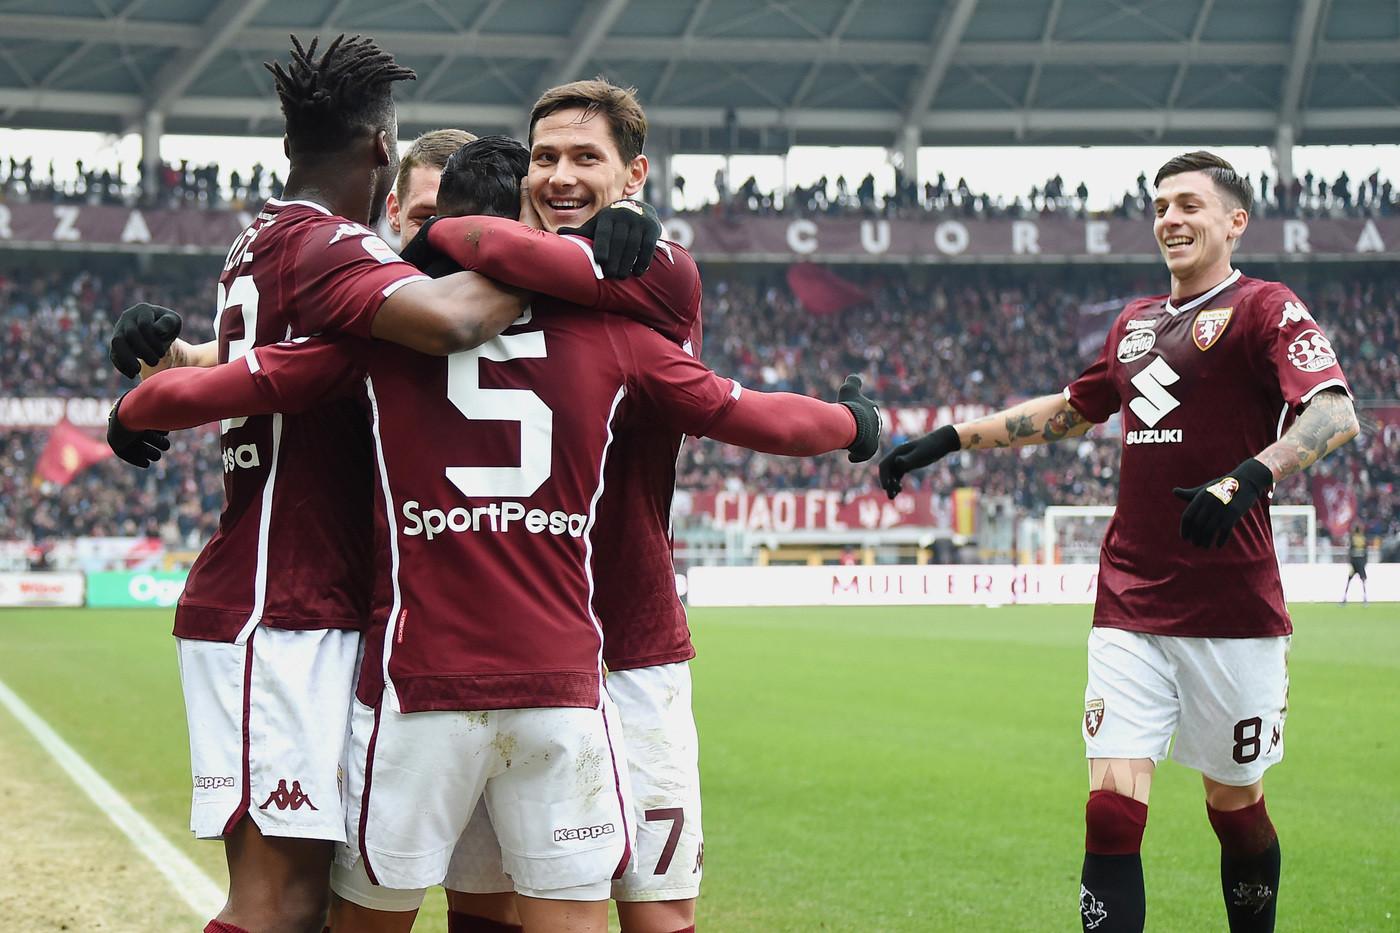 Serie A, Toro irrompe in zona Europa: Iago-Izzo, battuta e agganciata Atalanta